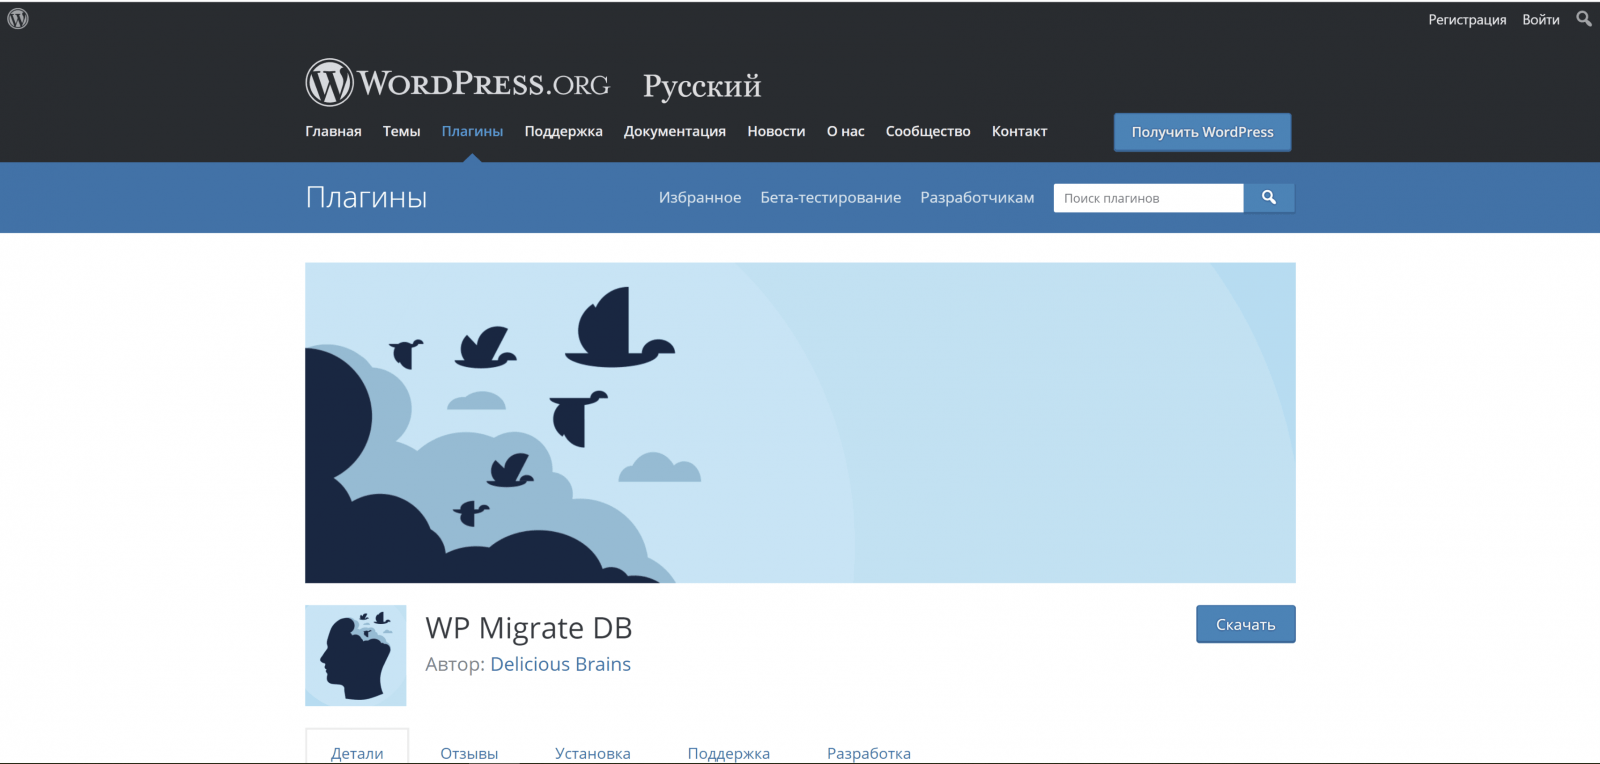 wp migrate data base blog